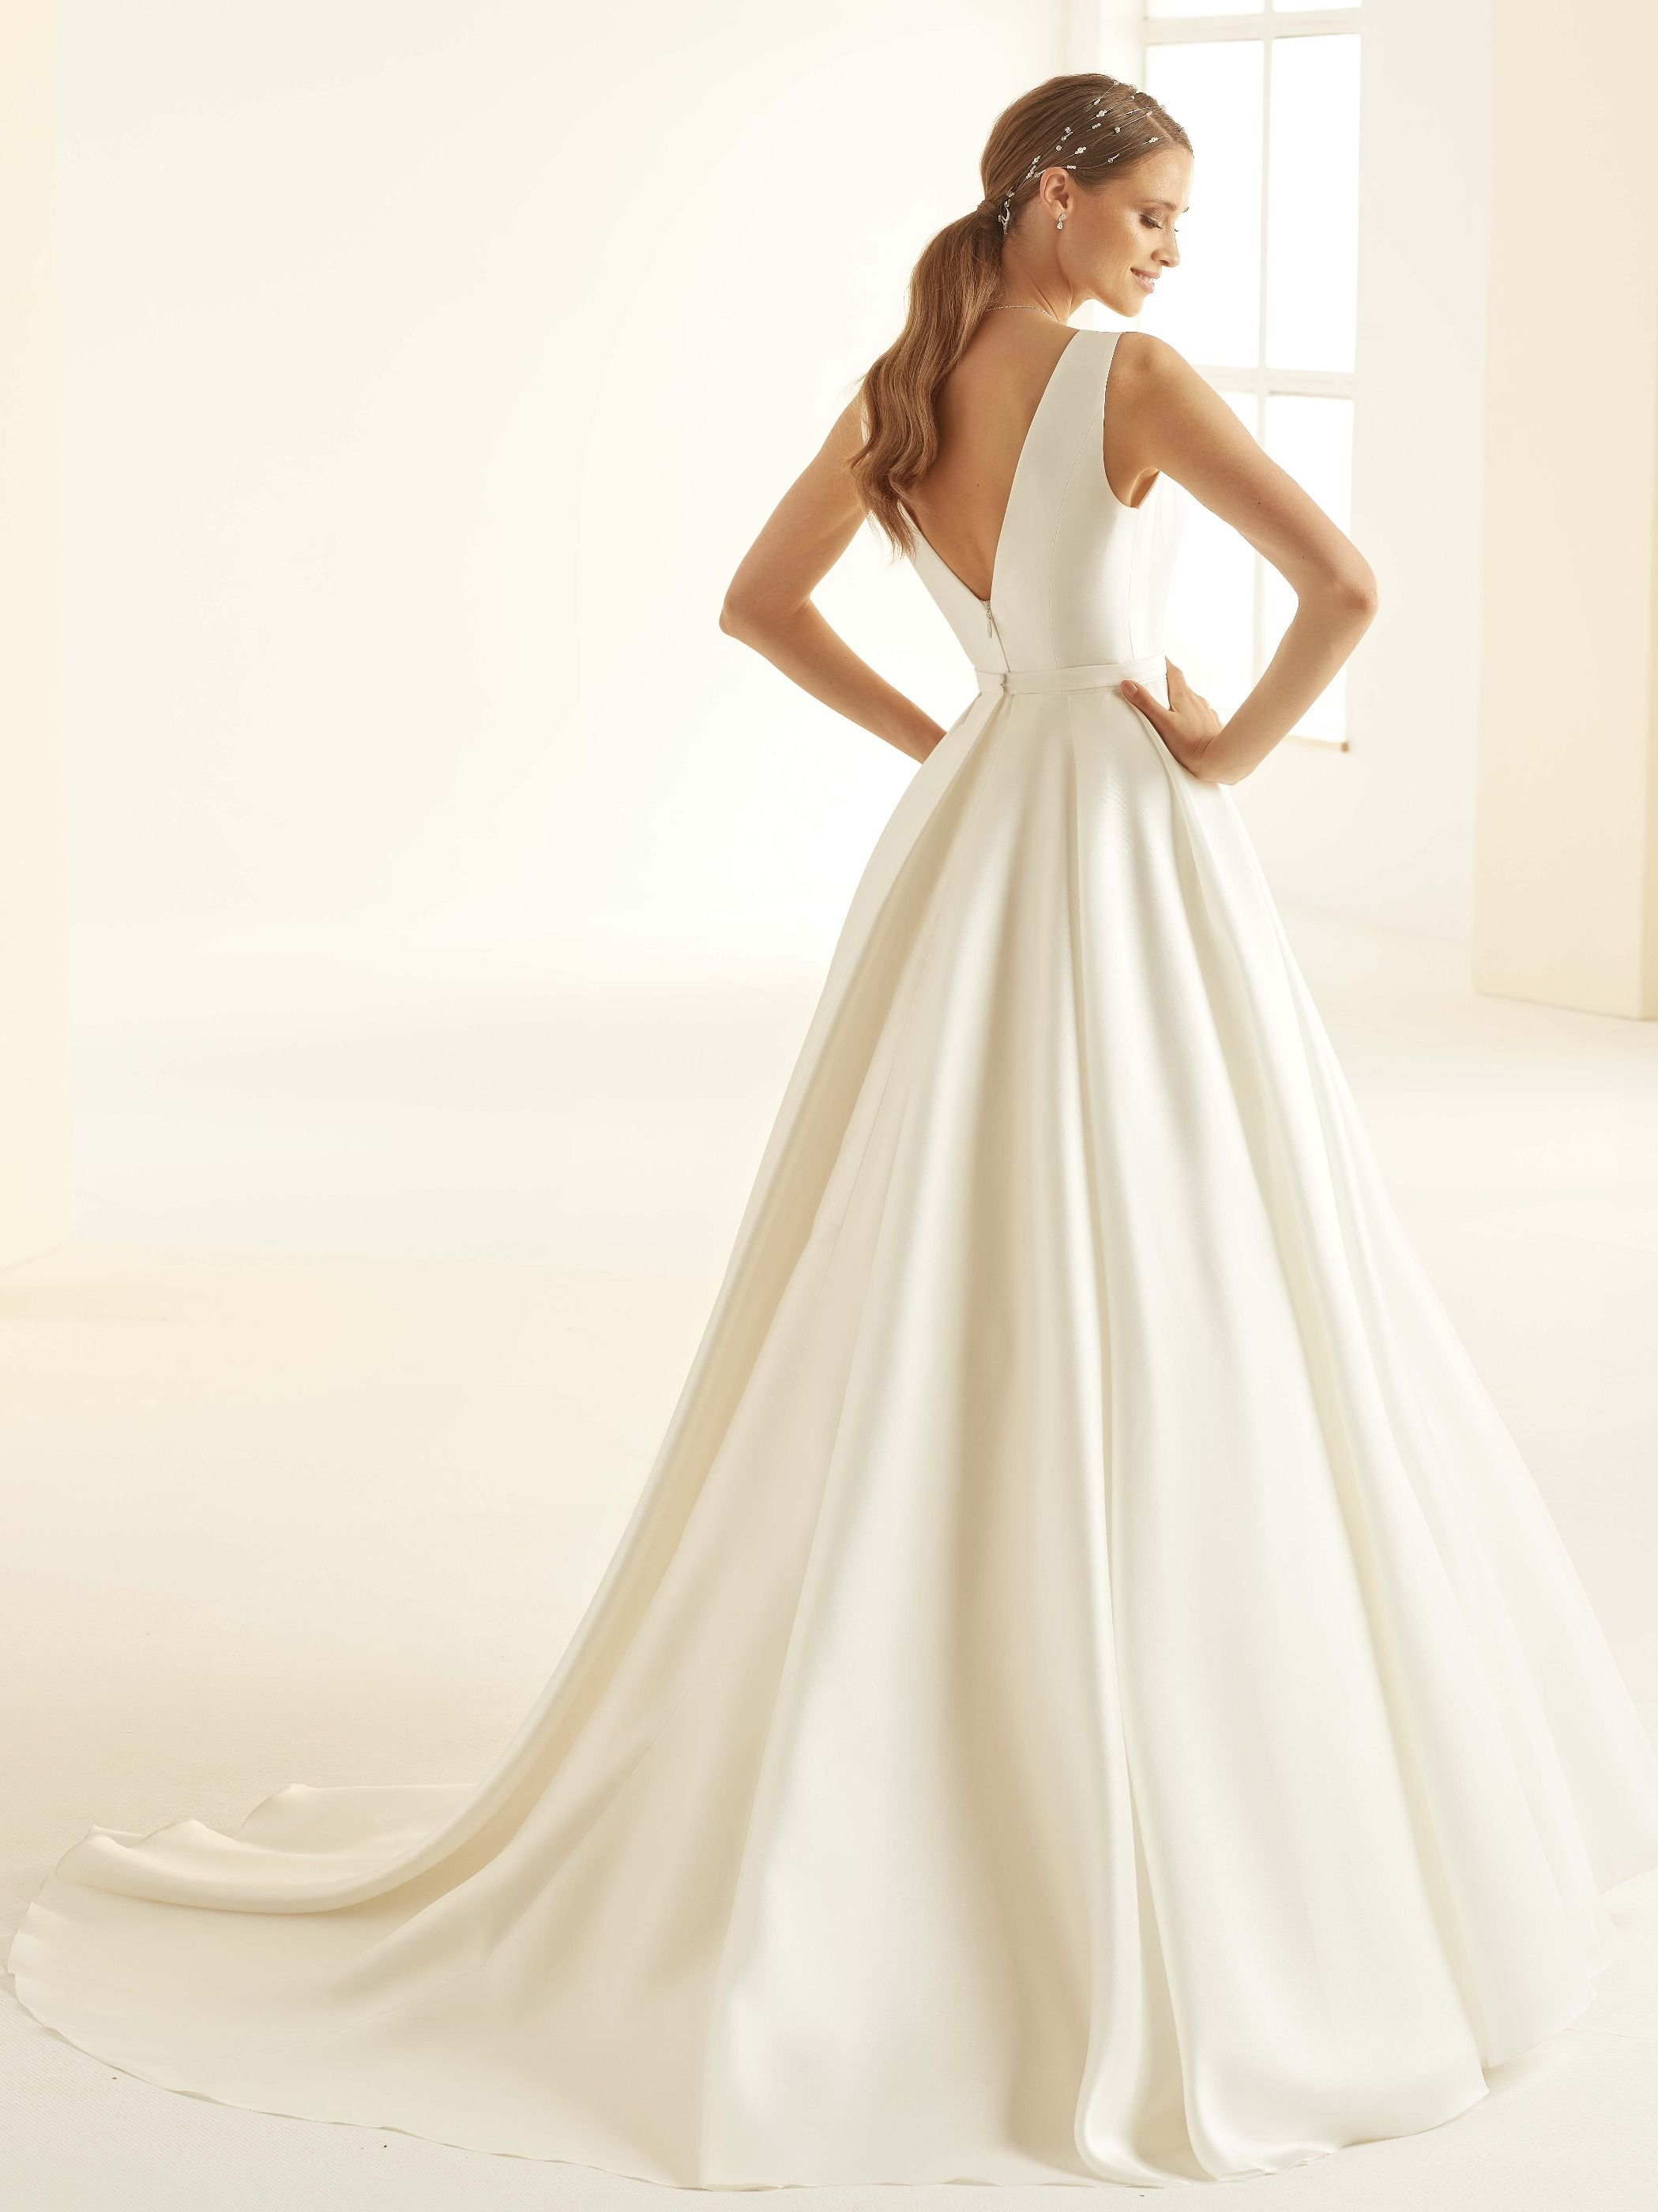 bianco_evento_bridal_dress_jessica_3_